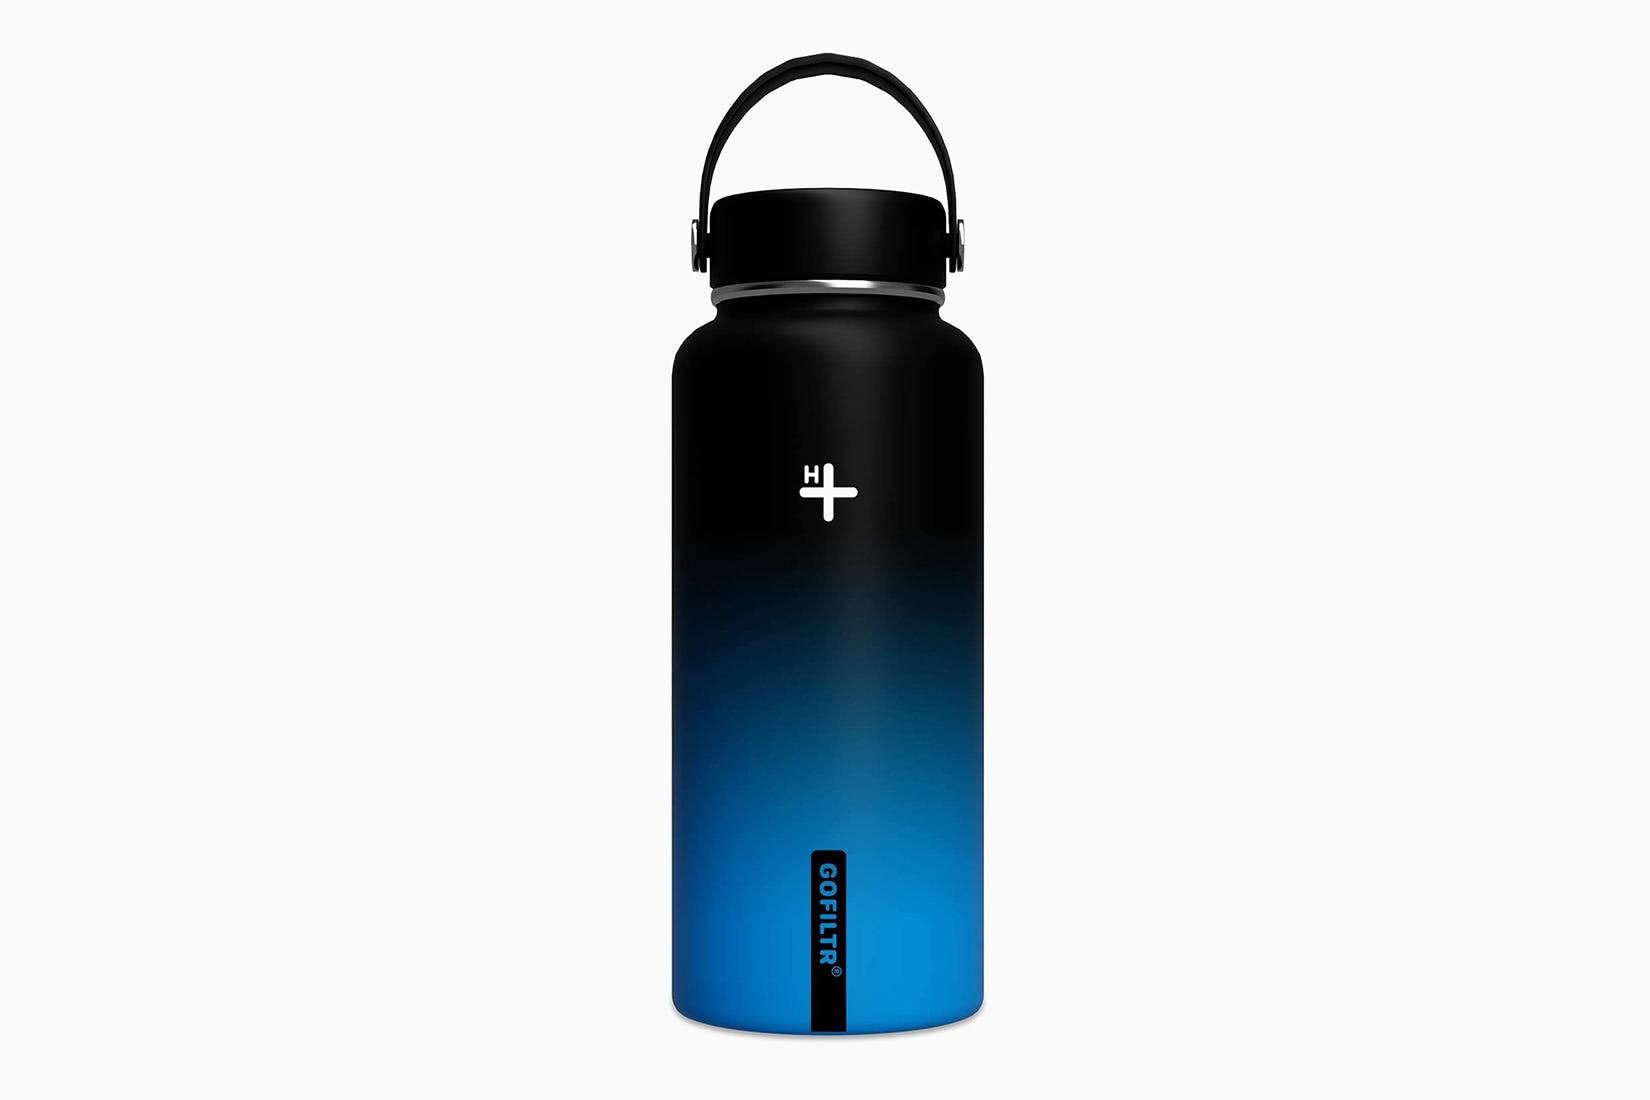 best water bottles ph raiser GOFILTR hydration kit - Luxe Digital